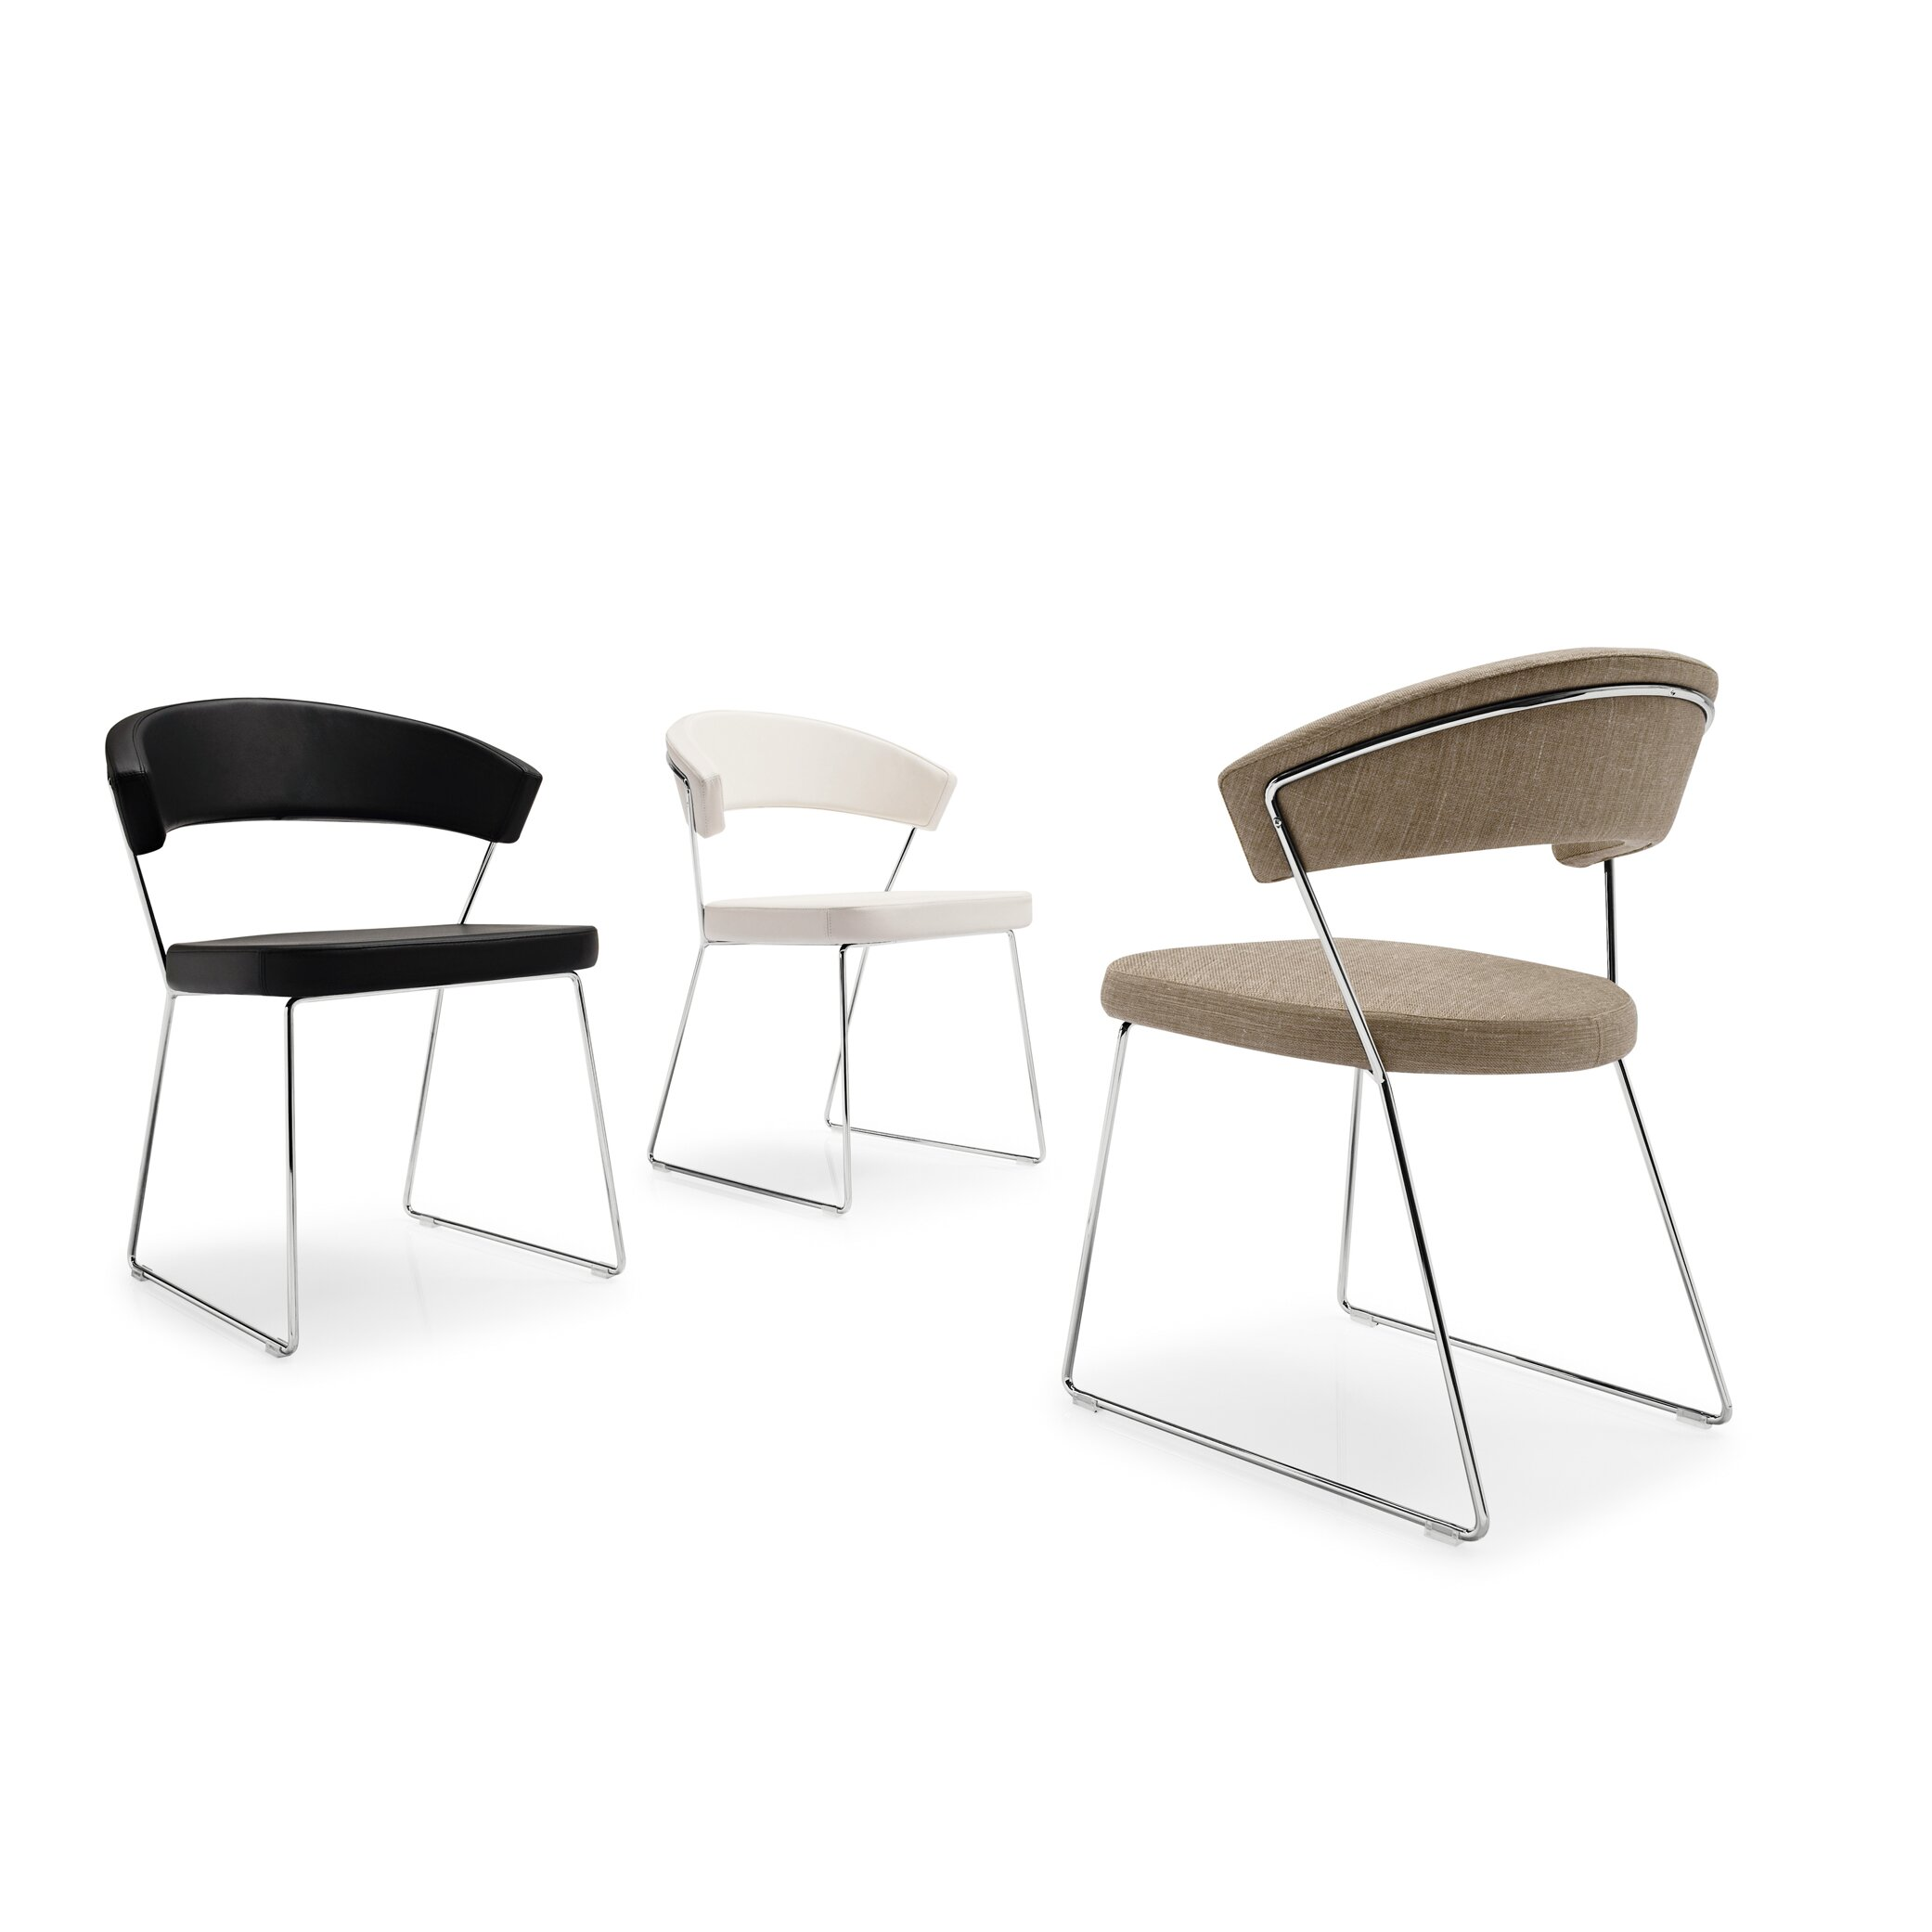 Calligaris new york sled base chair reviews wayfair for Calligaris new york